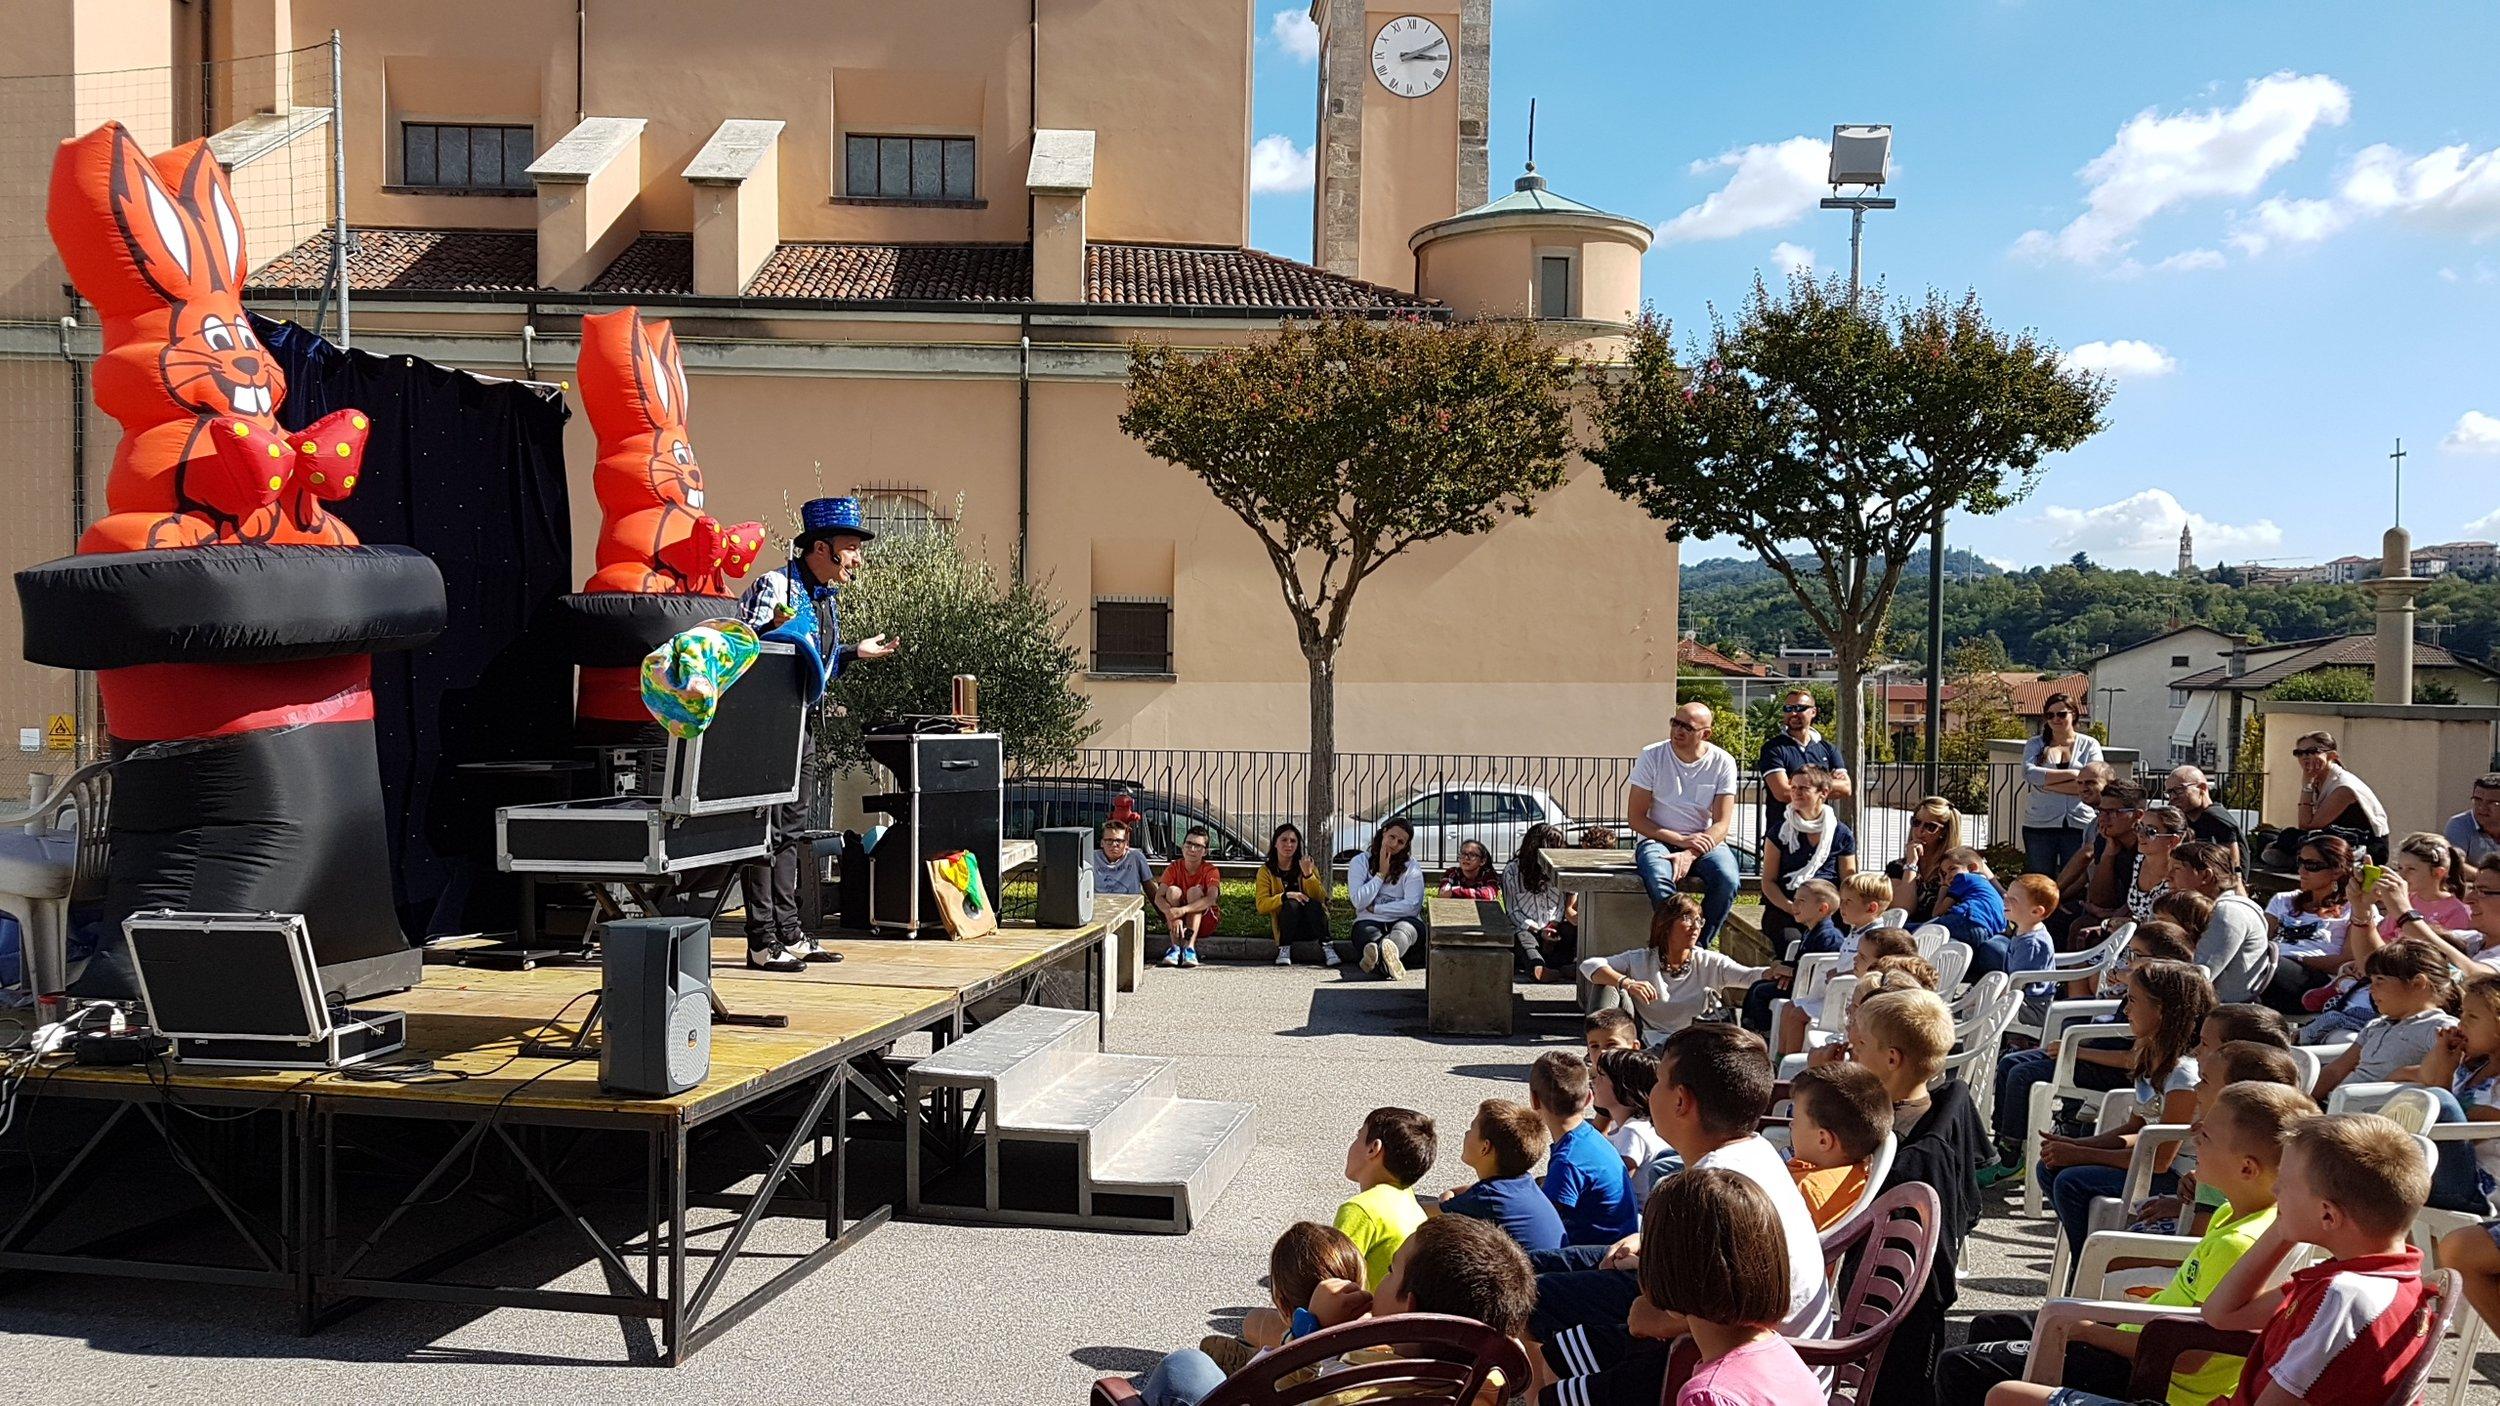 Festa di S. Bernardo 2017 (8).jpg